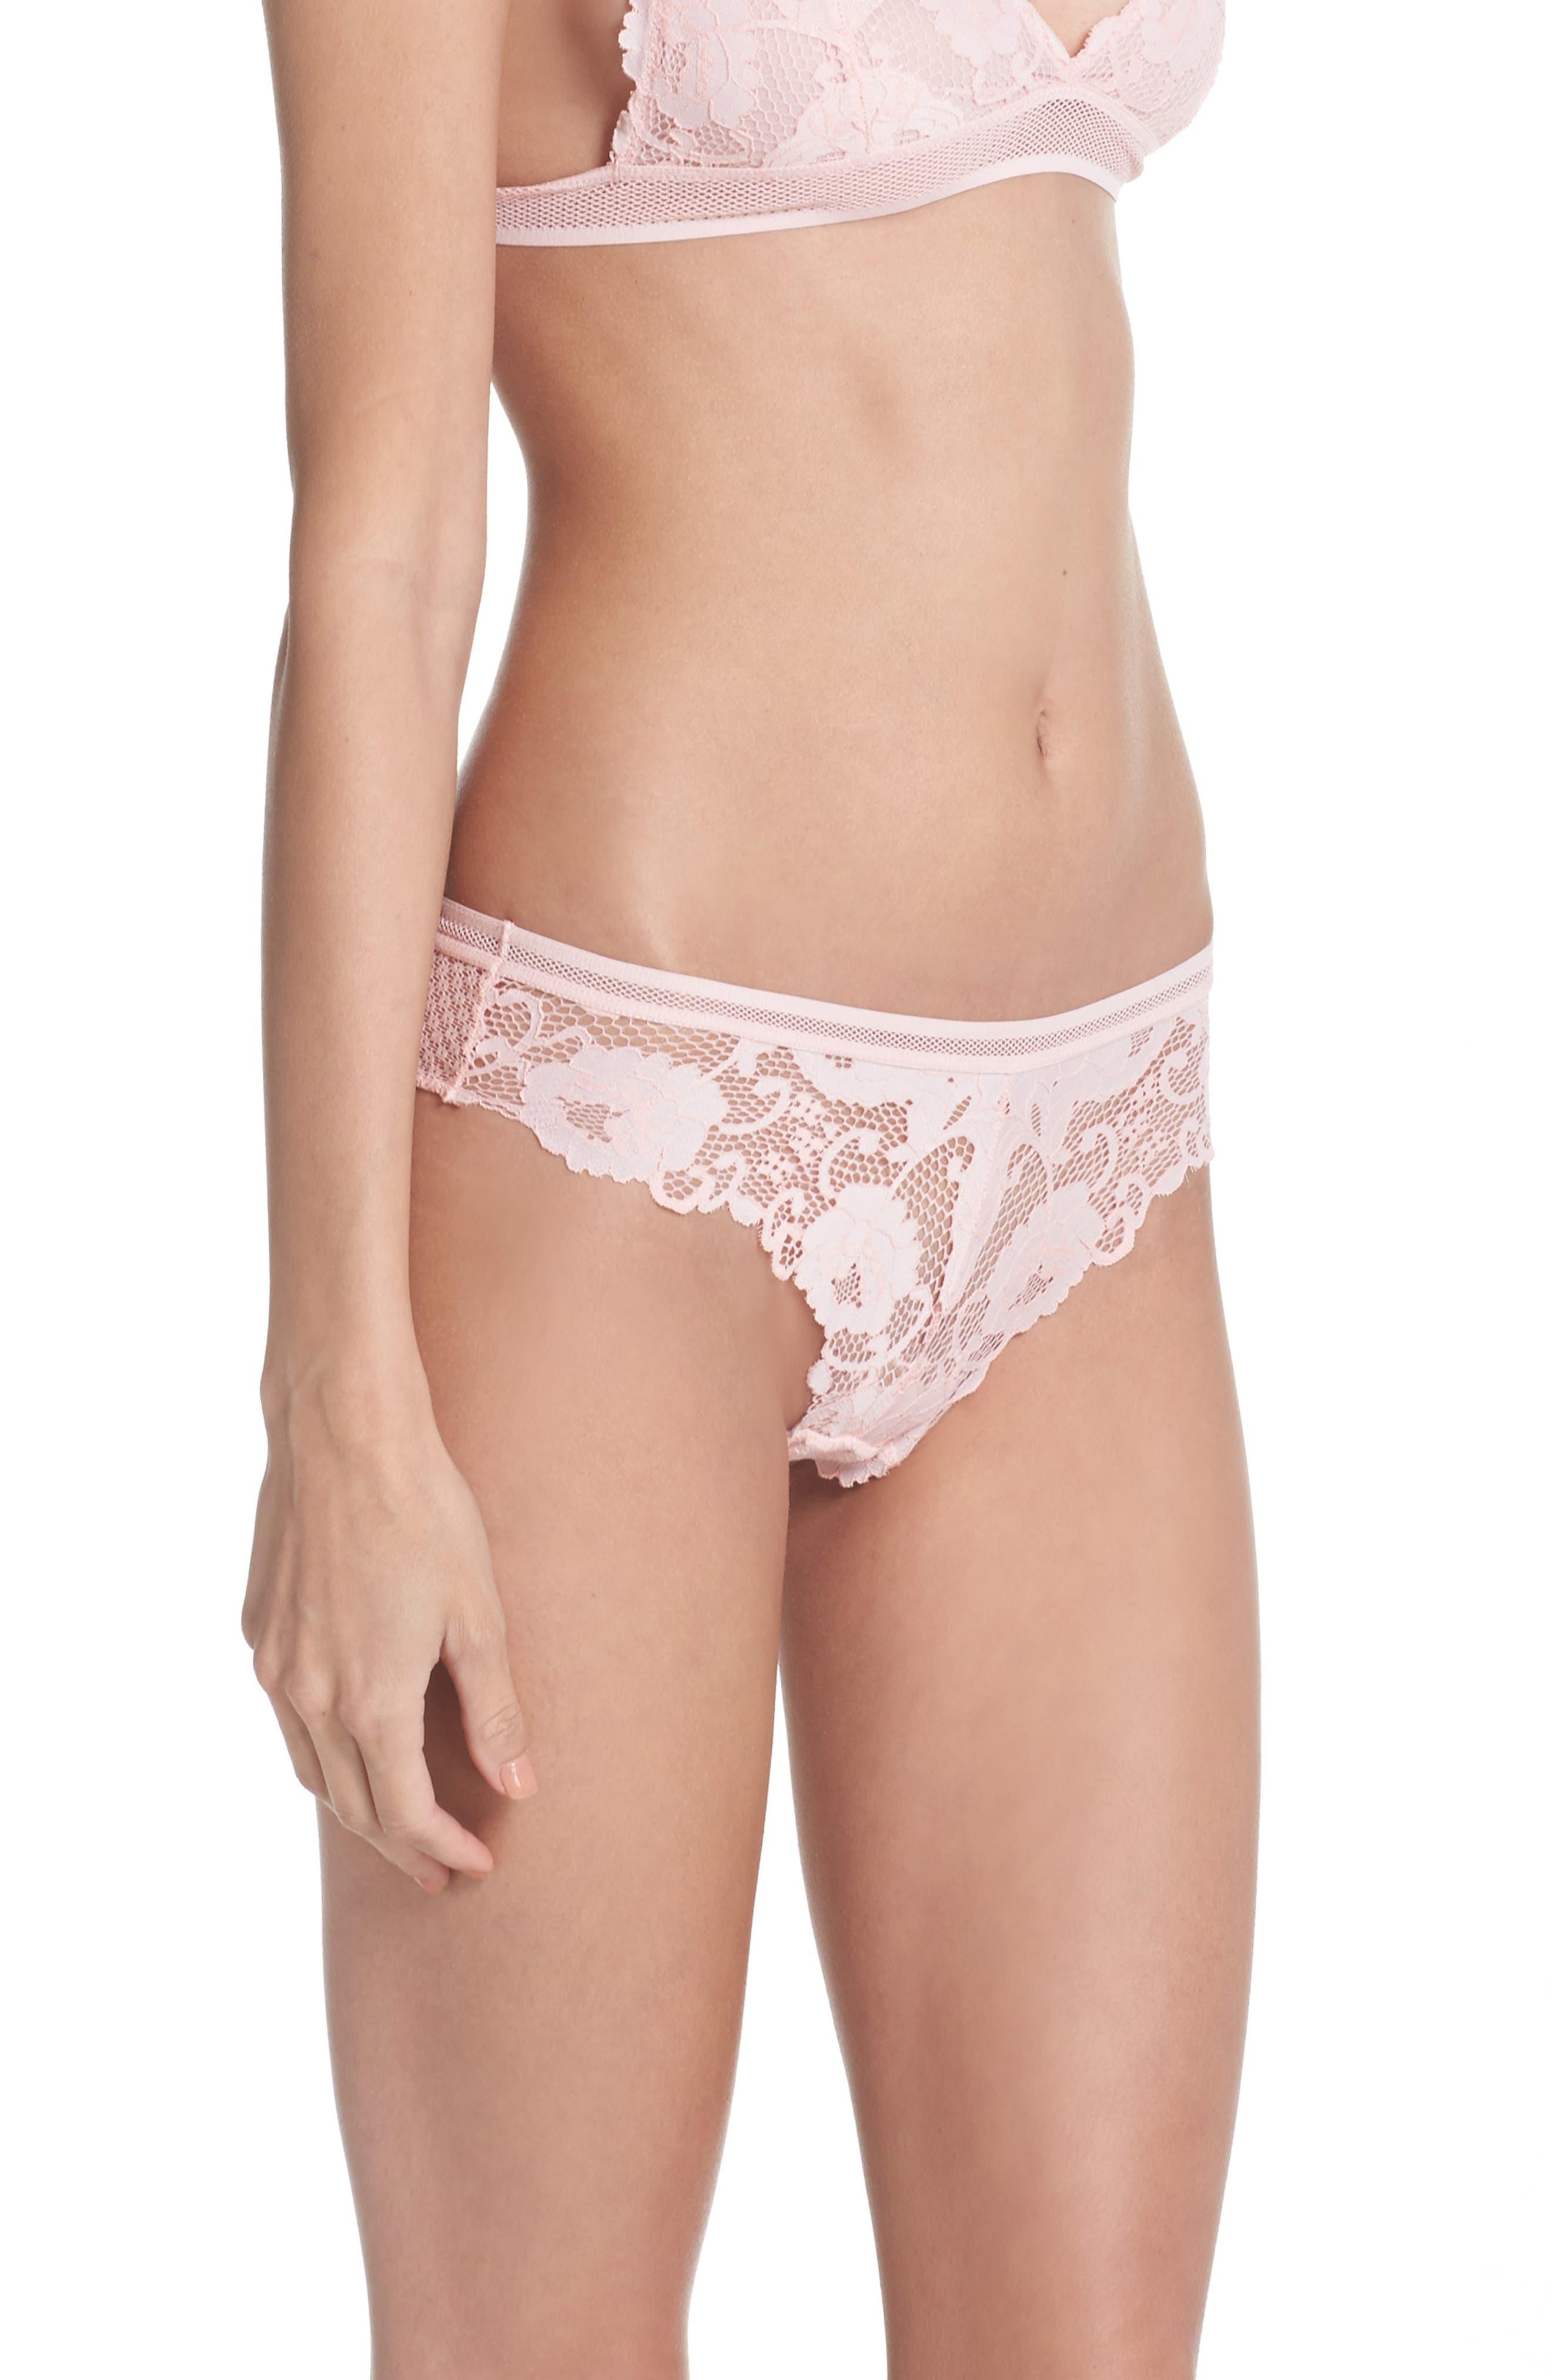 Alternate Image 3  - Sam Edelman Lace Thong (3 for $33)